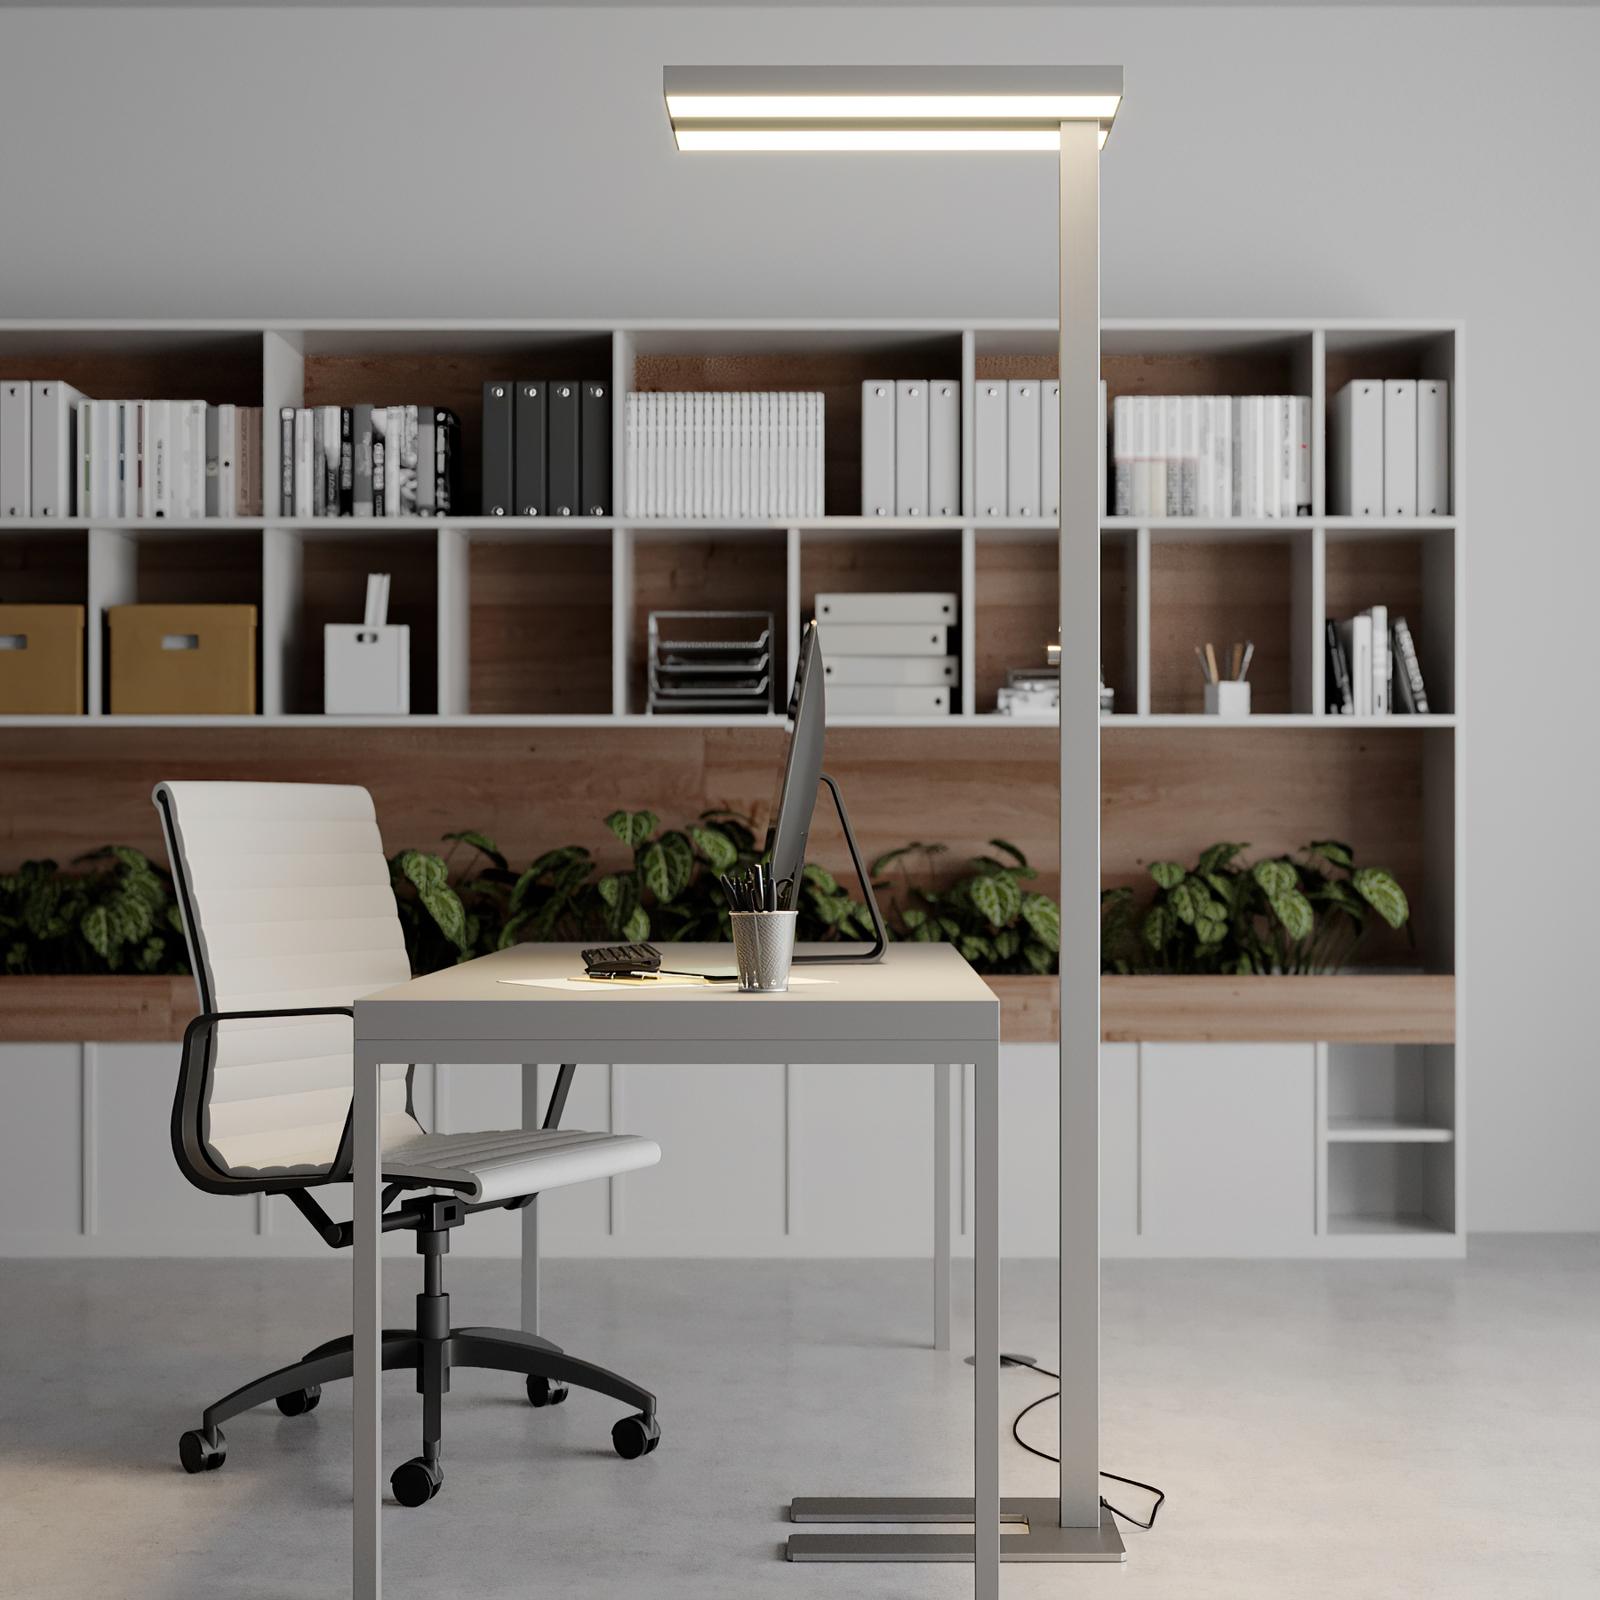 Dimmable LED office floor lamp Logan 4,000 K_9968003_1